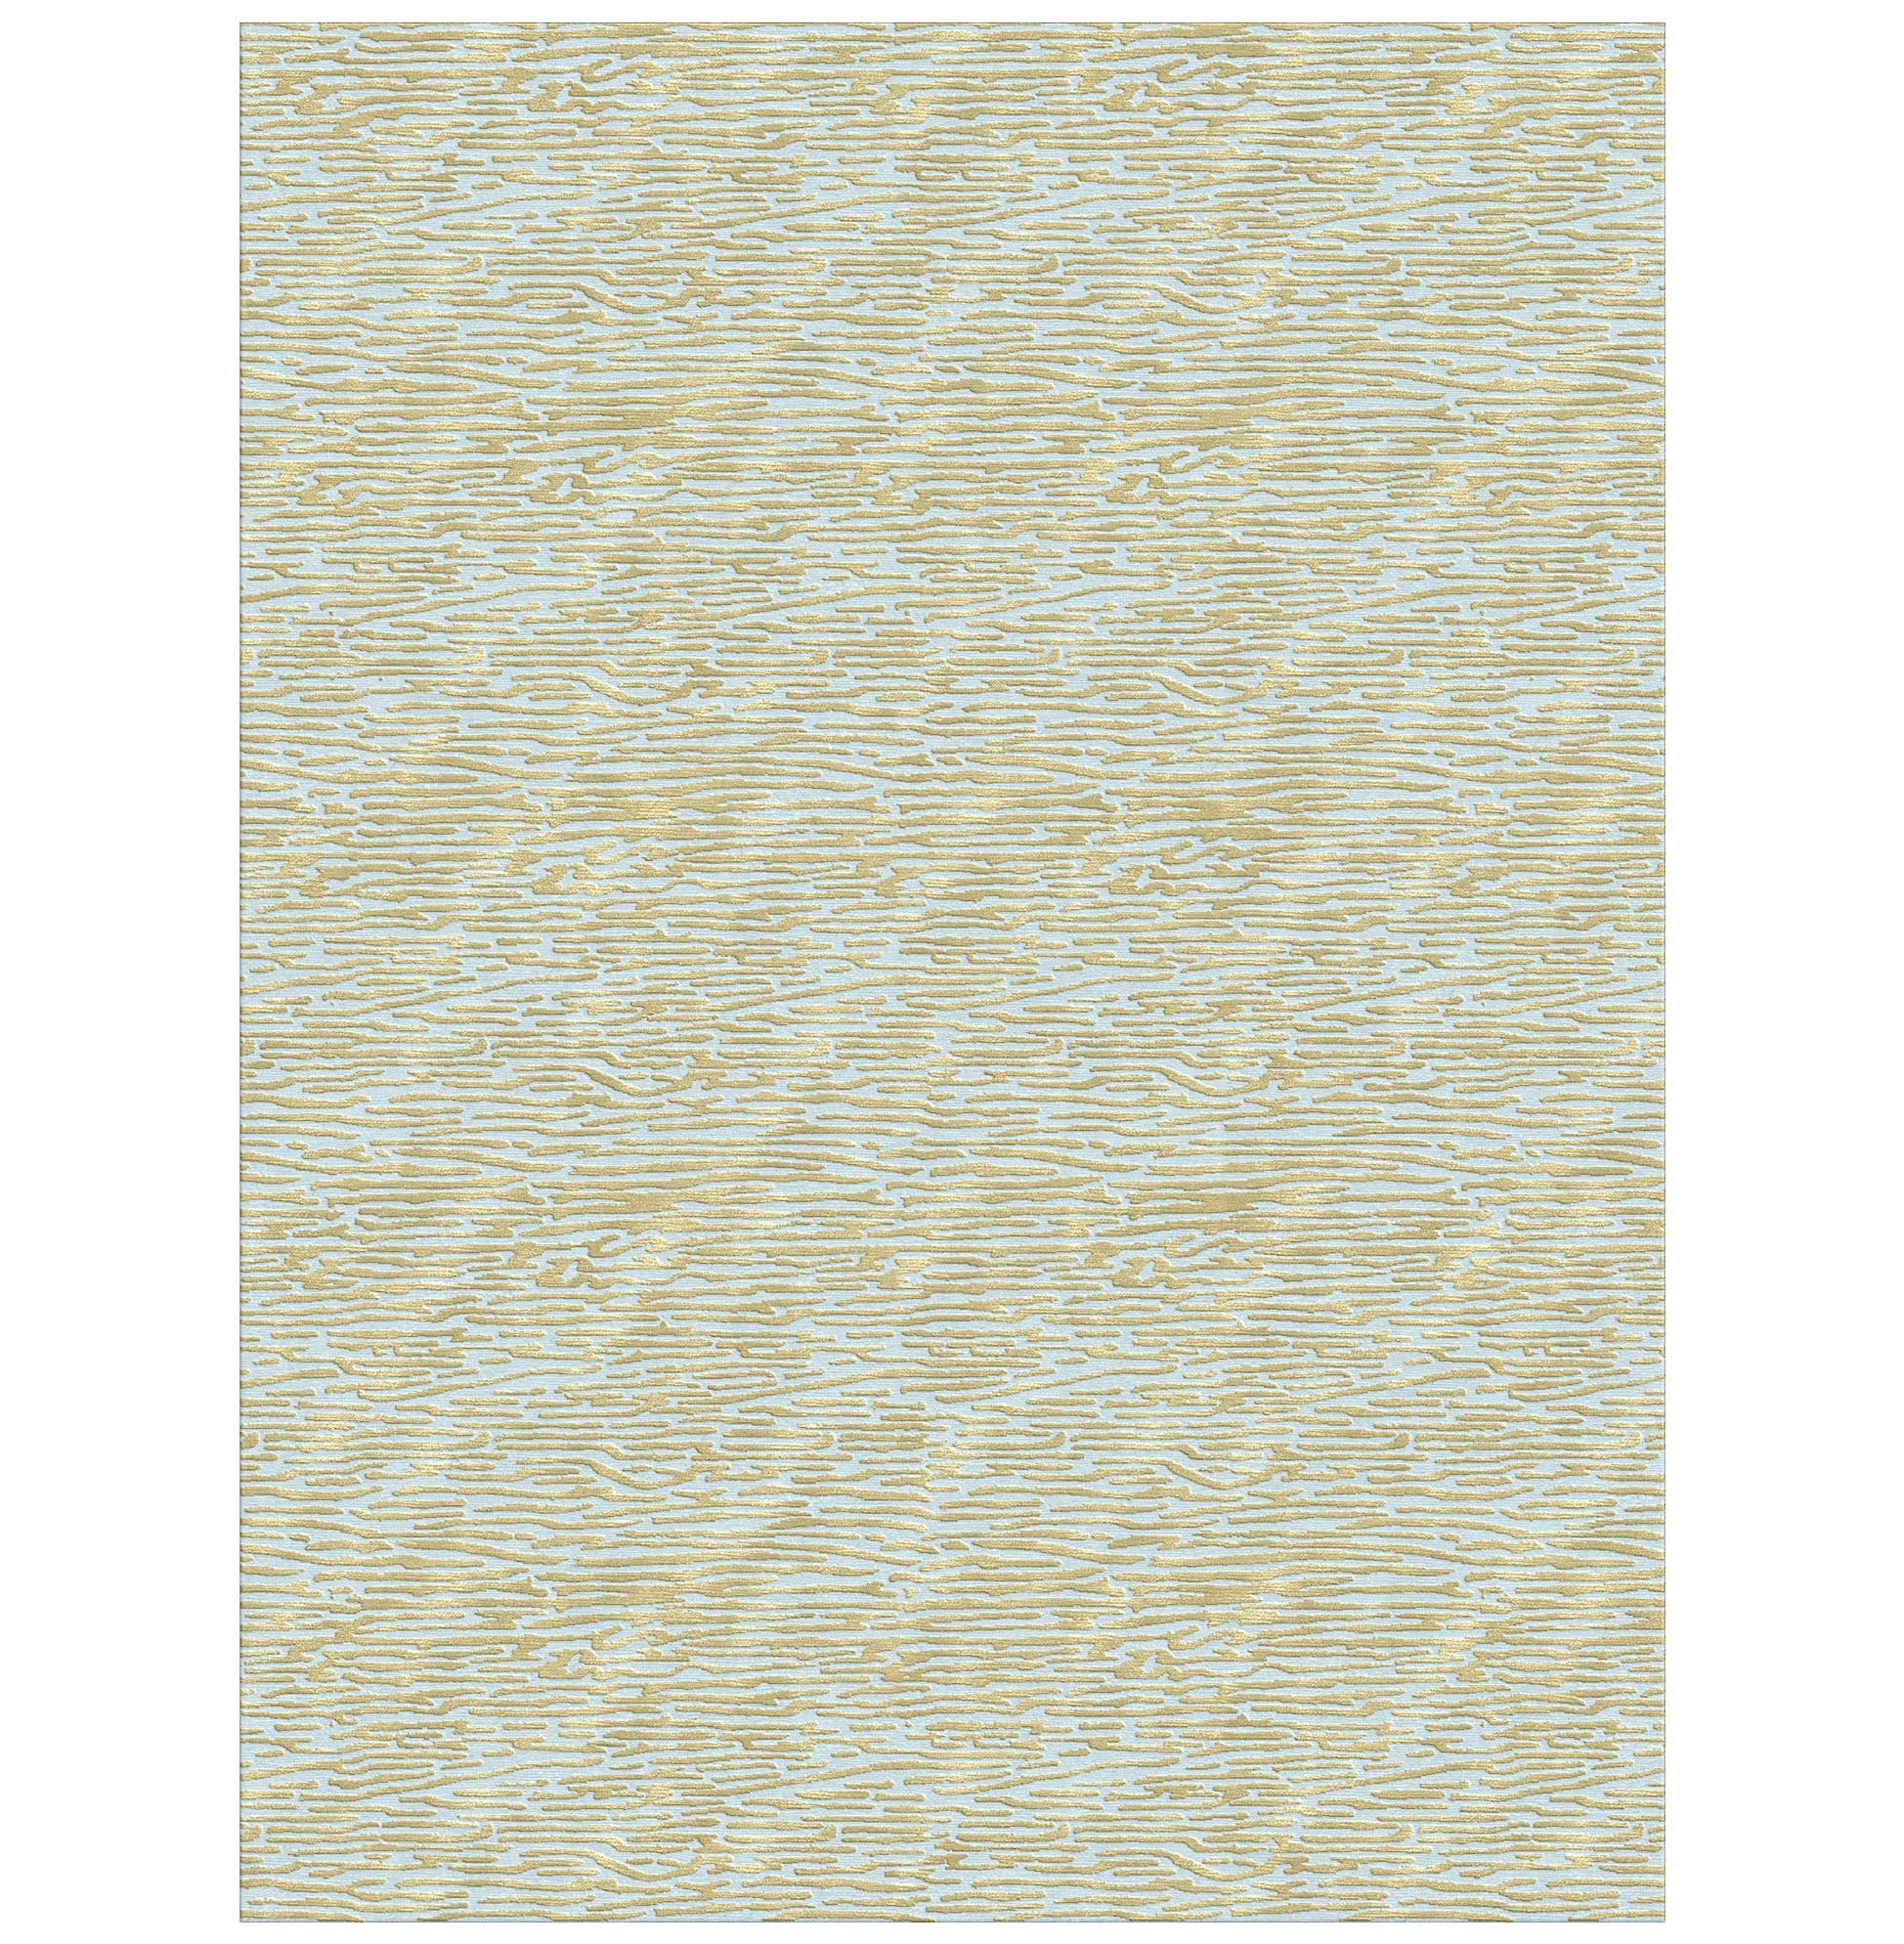 Jules Blue Gold Hand Knotted Tibetan Wool Rug - 4x6